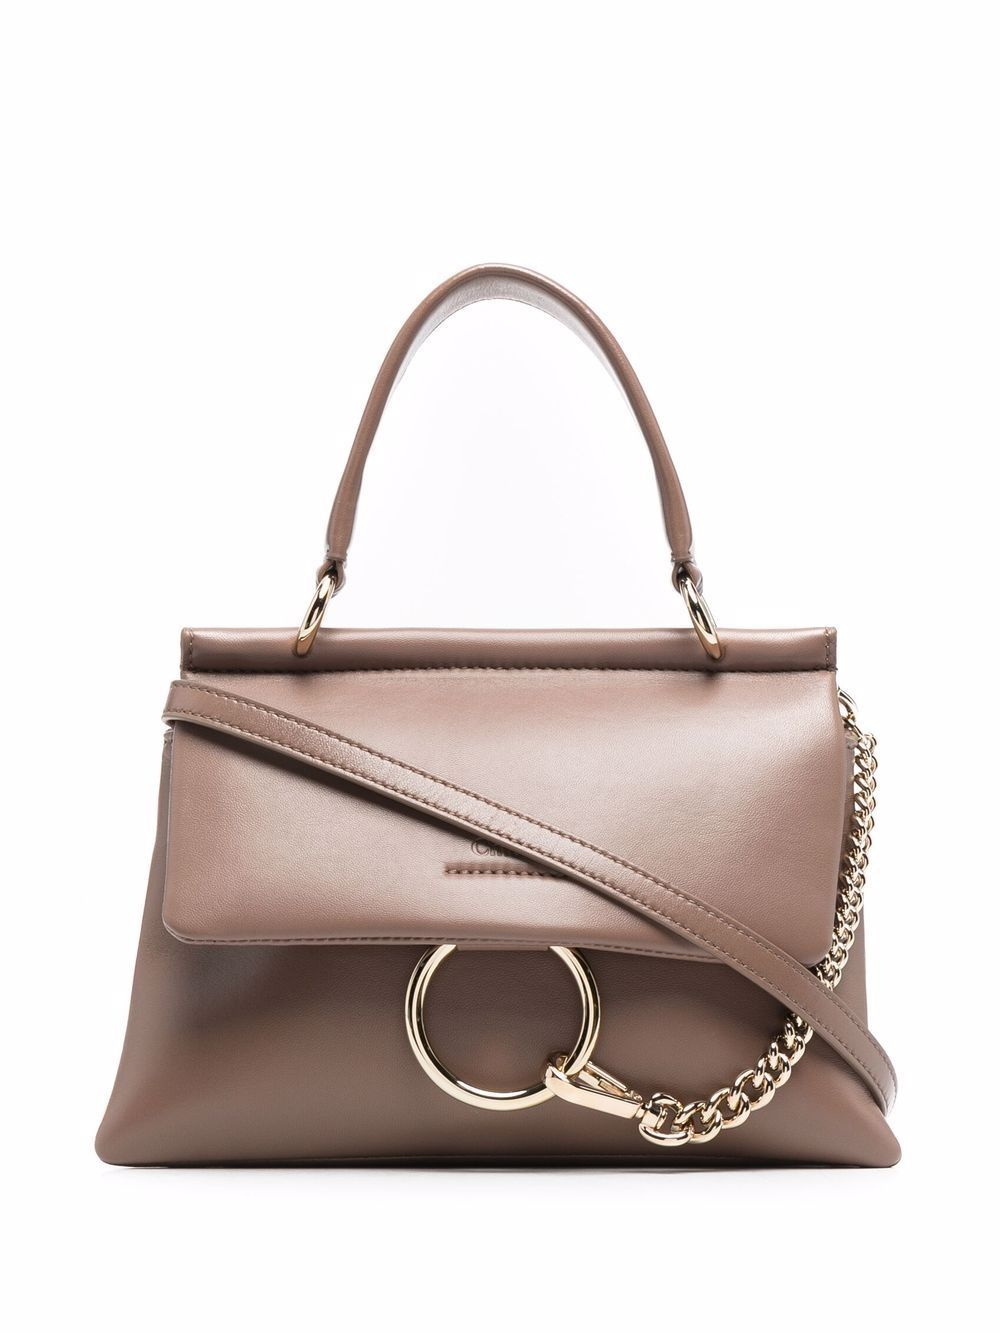 Faye mini leather handbag